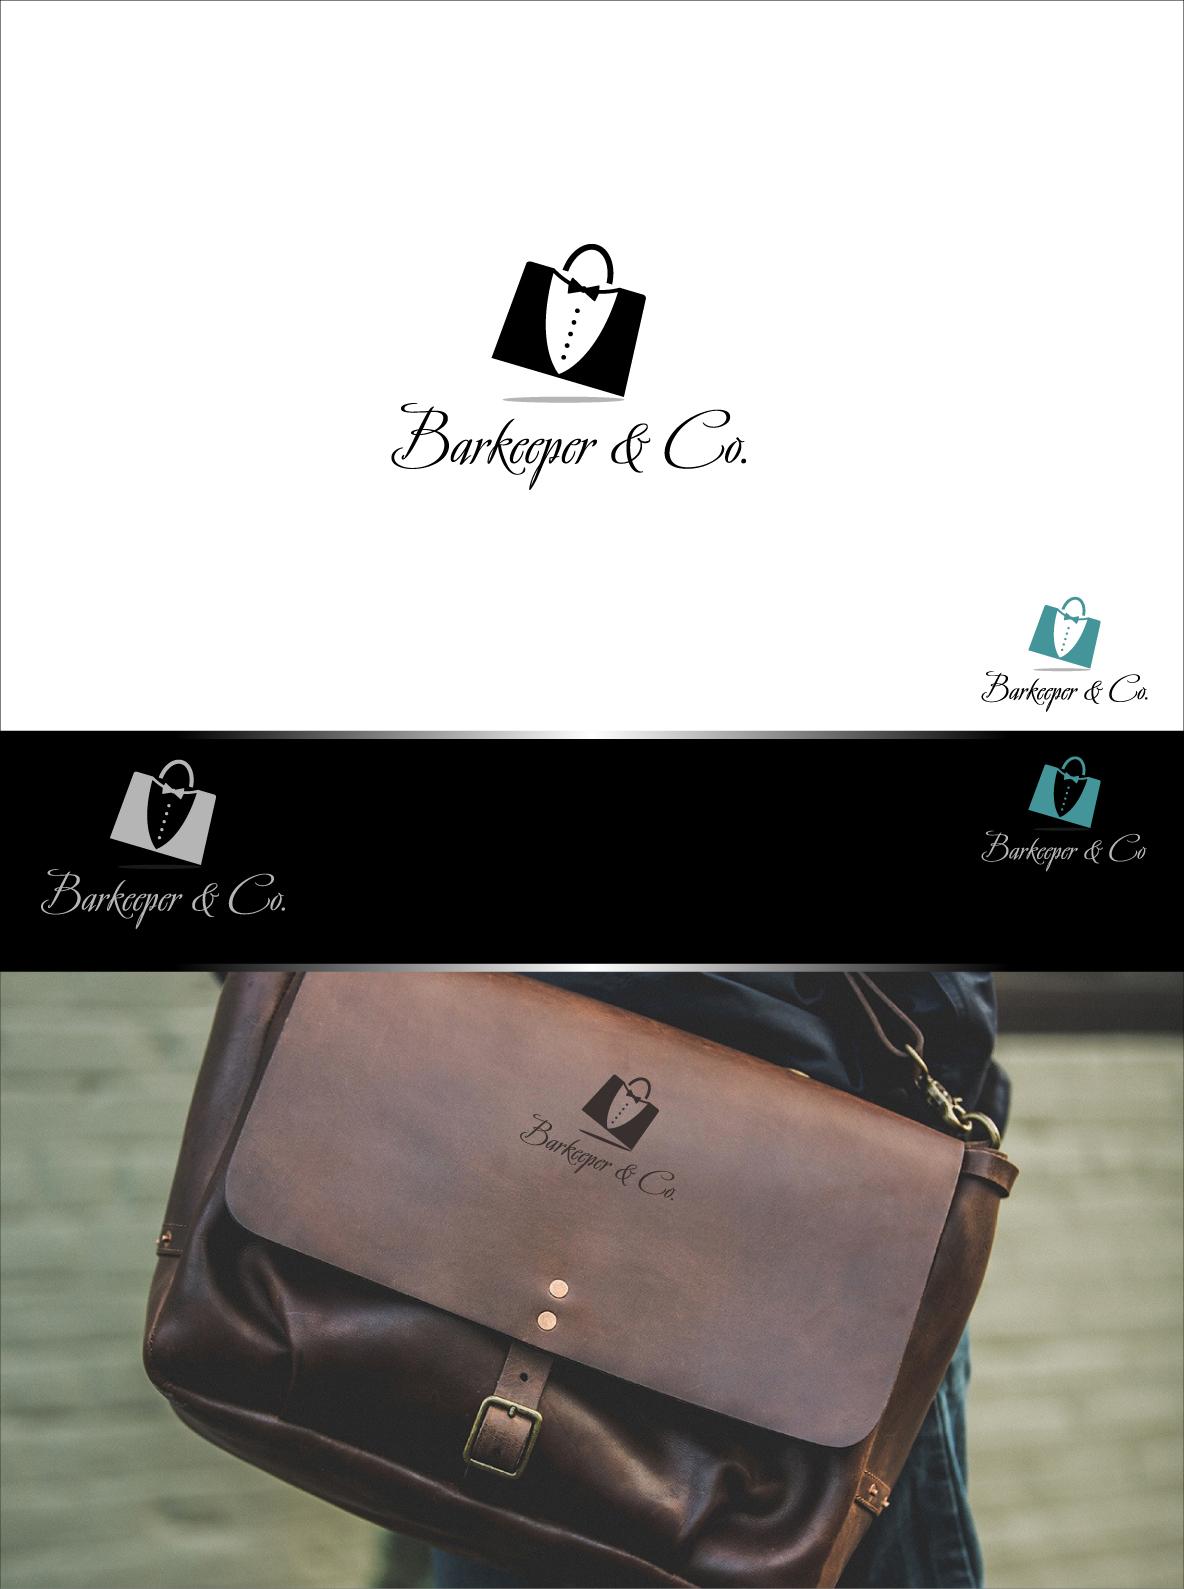 Logo Design by zoiDesign - Entry No. 76 in the Logo Design Contest Artistic Logo Design.